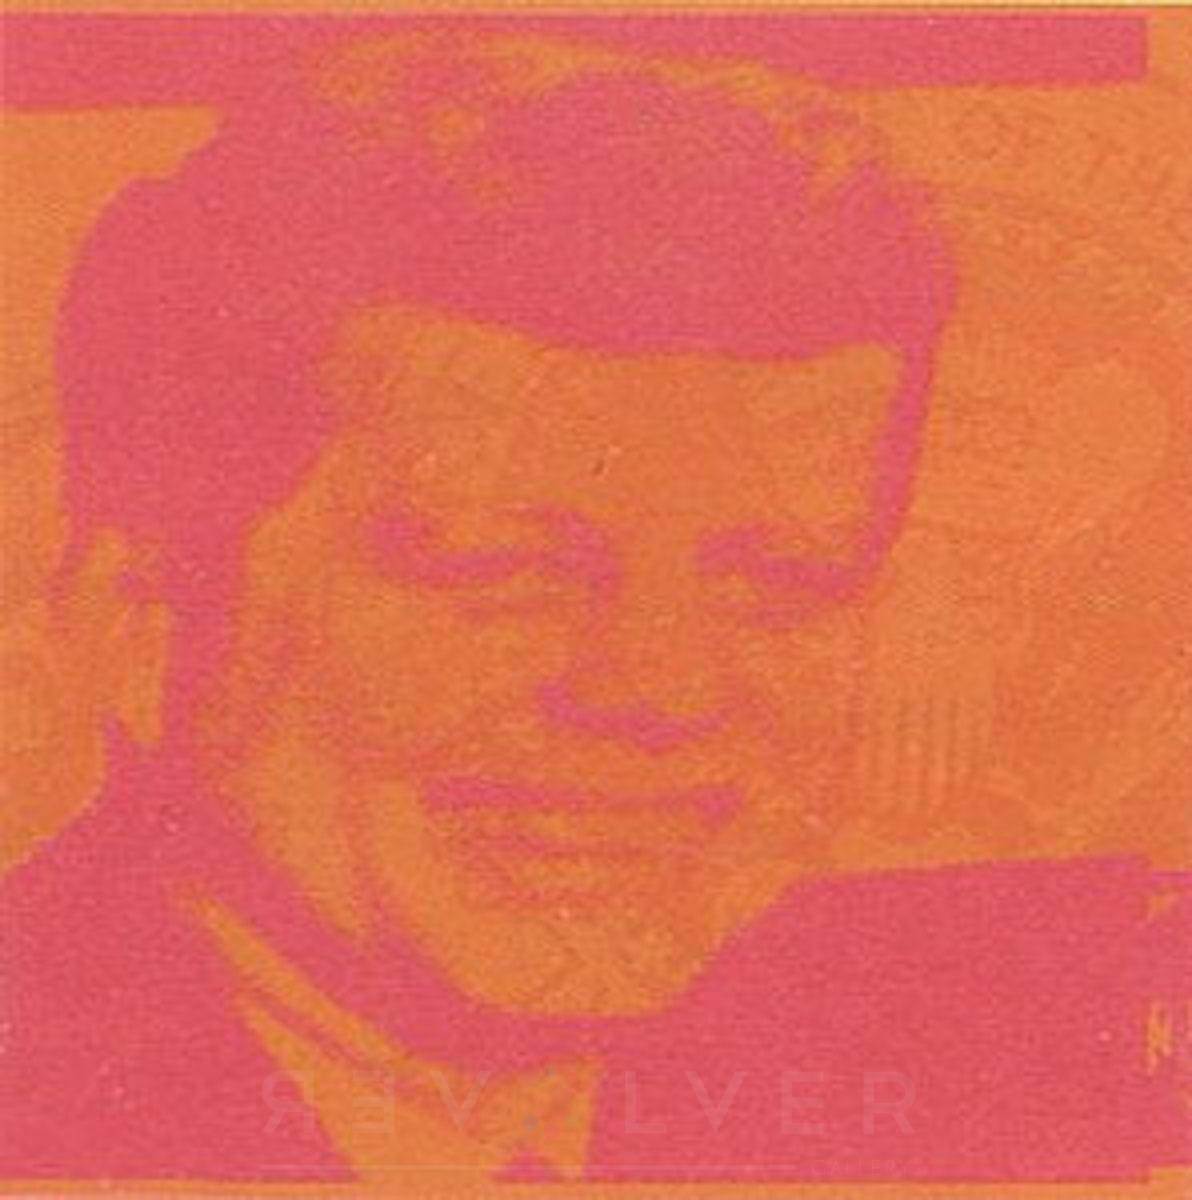 Andy Warhol - Flash F.S. II 43b jpg